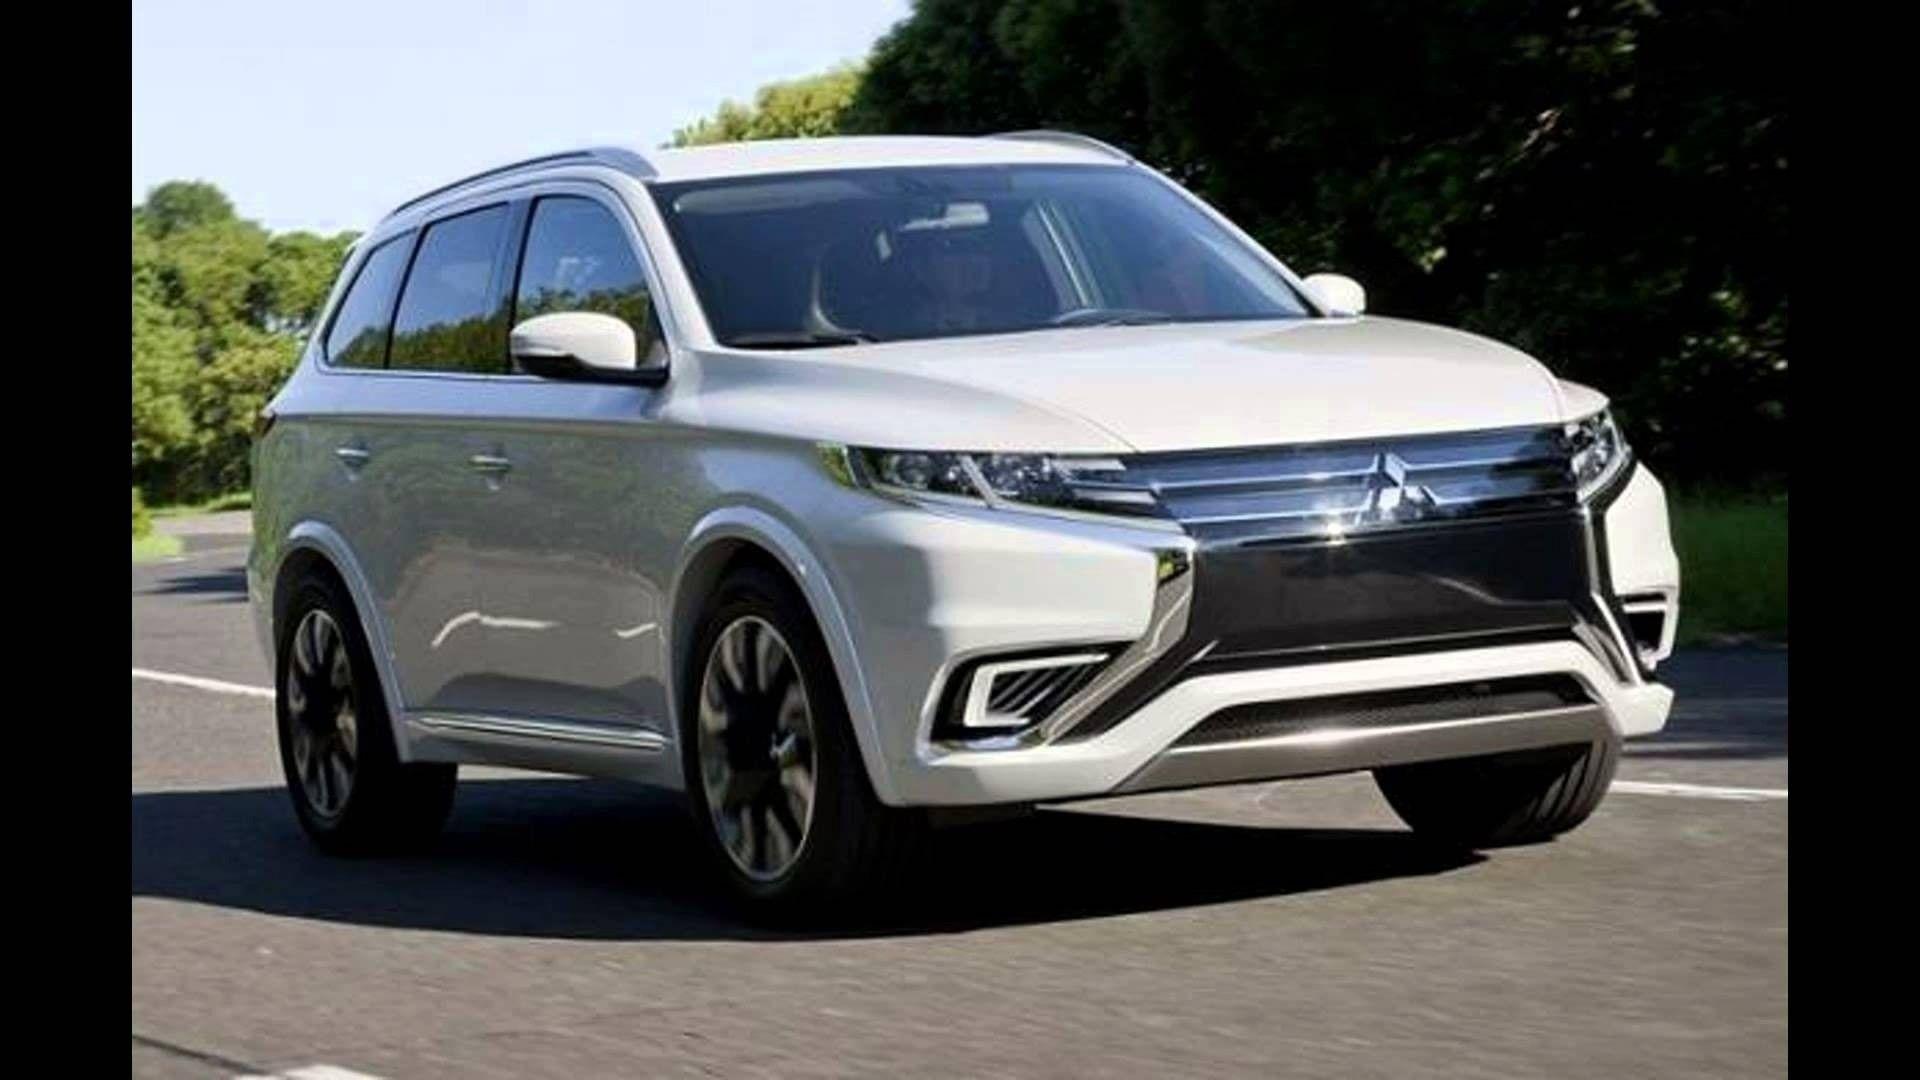 2019 Mitsubishi Montero Limited Exterior and Interior